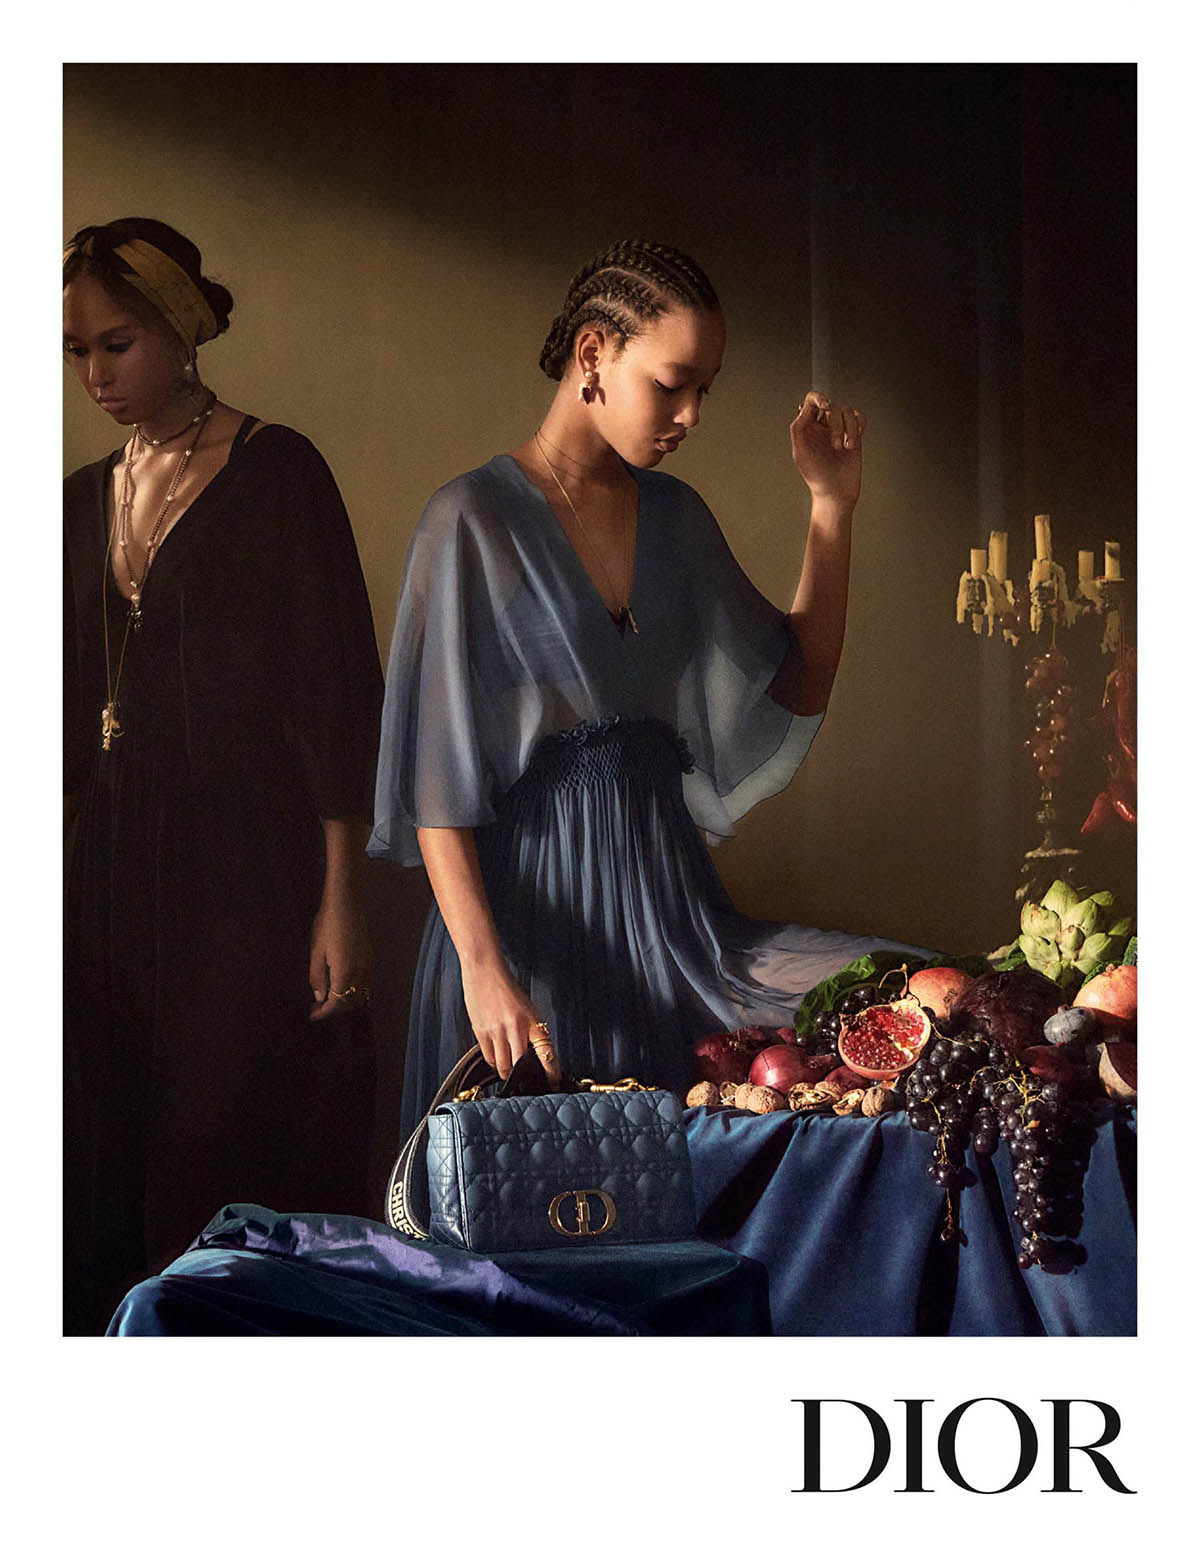 Dior Spring Summer 2021 Campaign